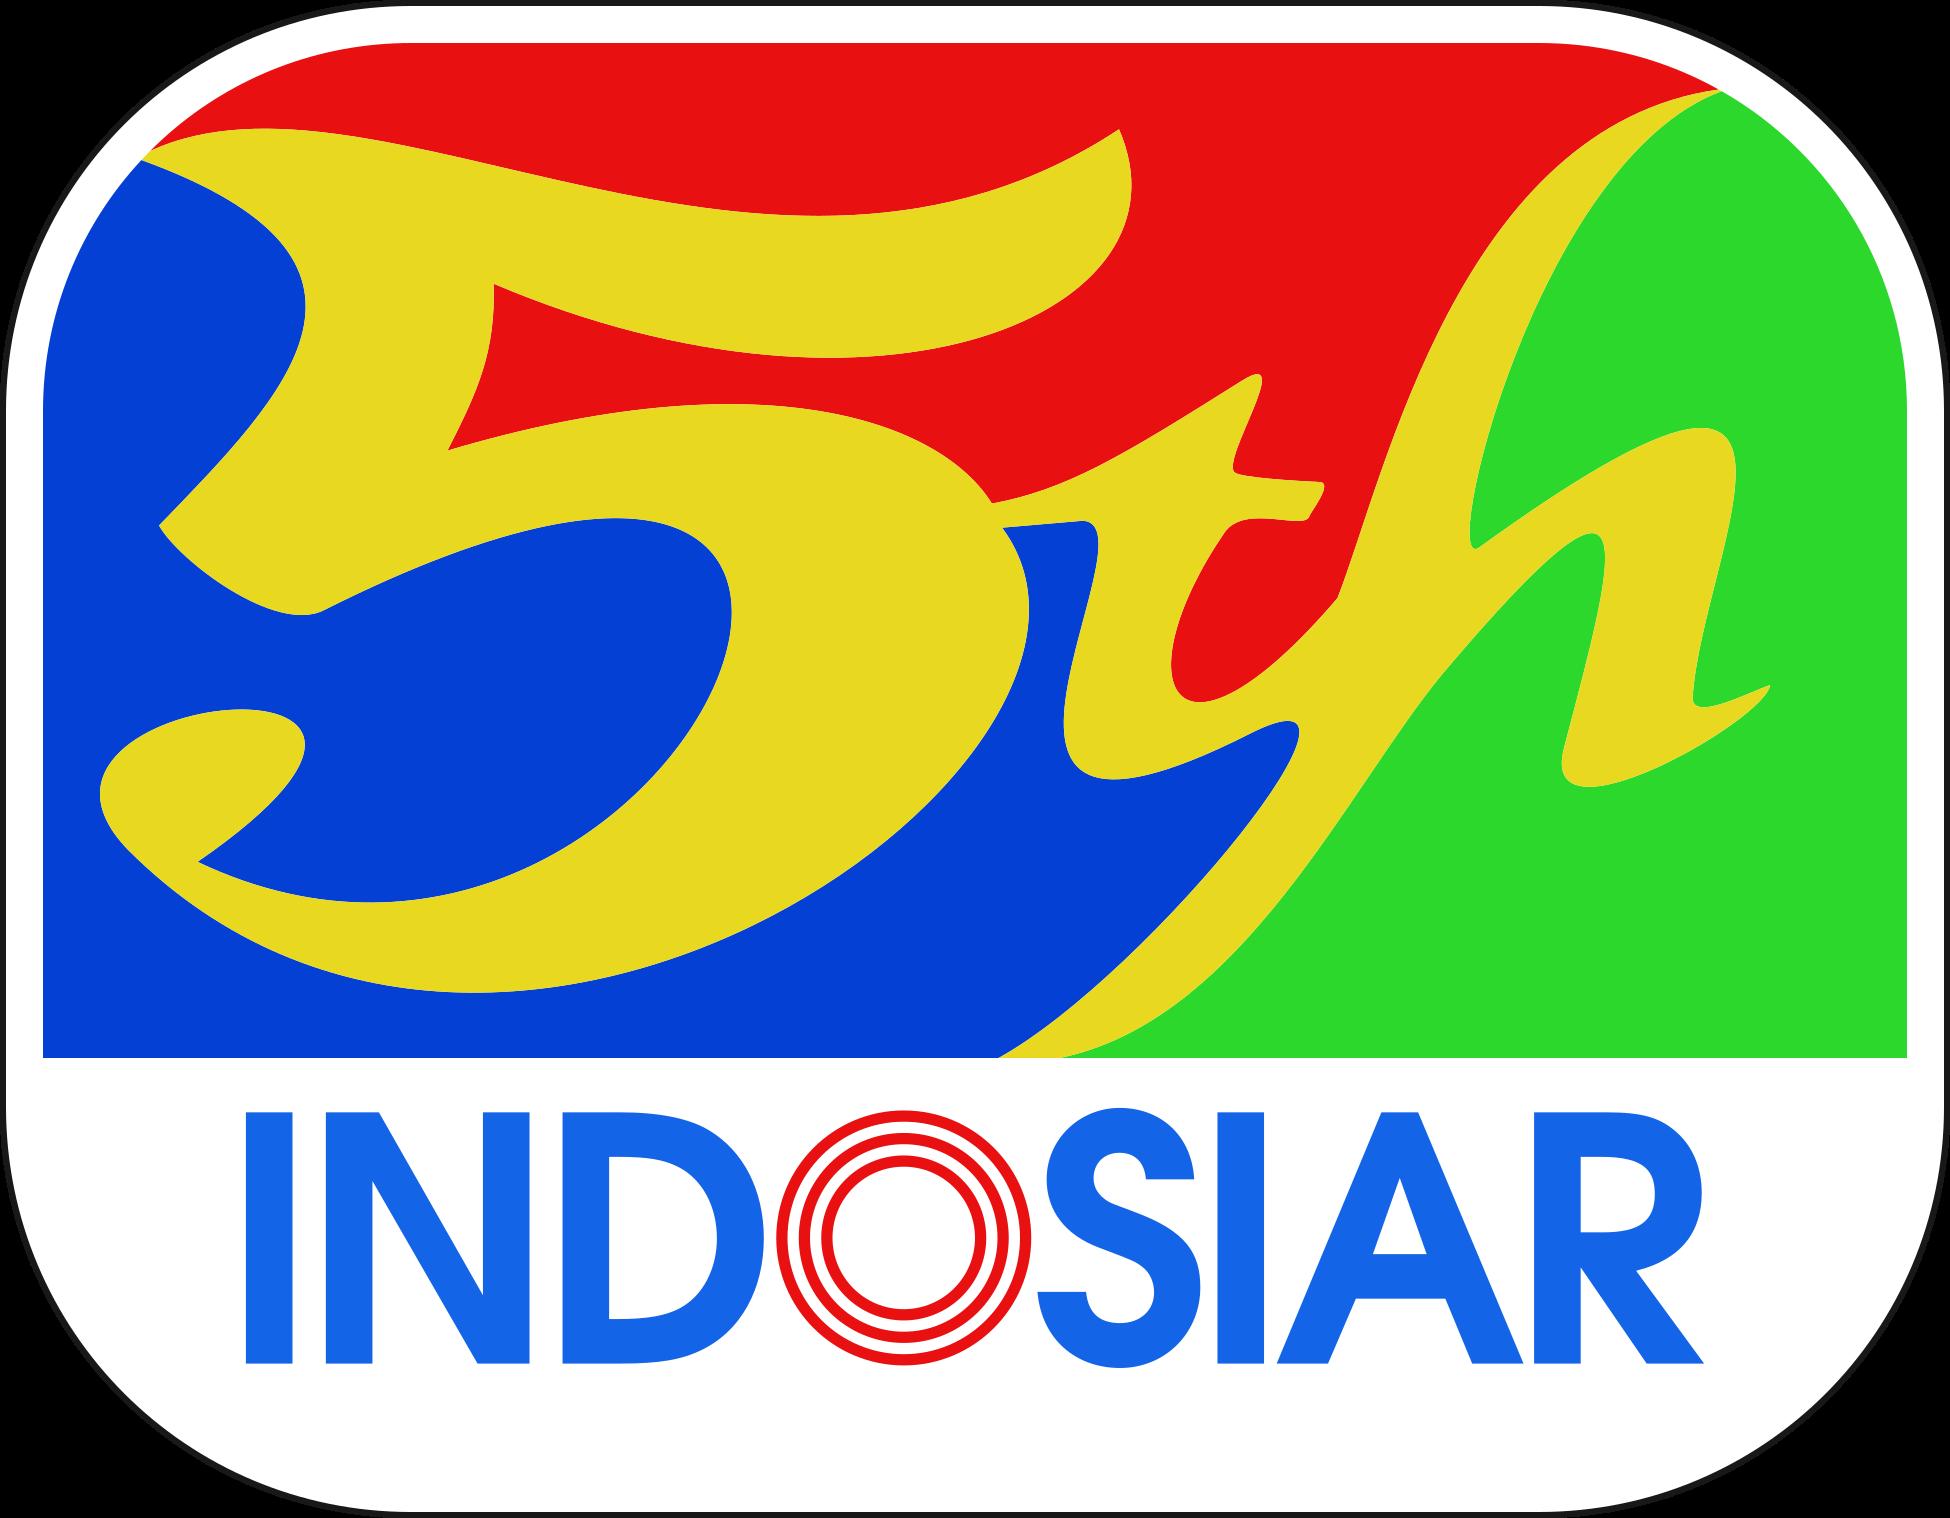 Indosiar 5 tahun